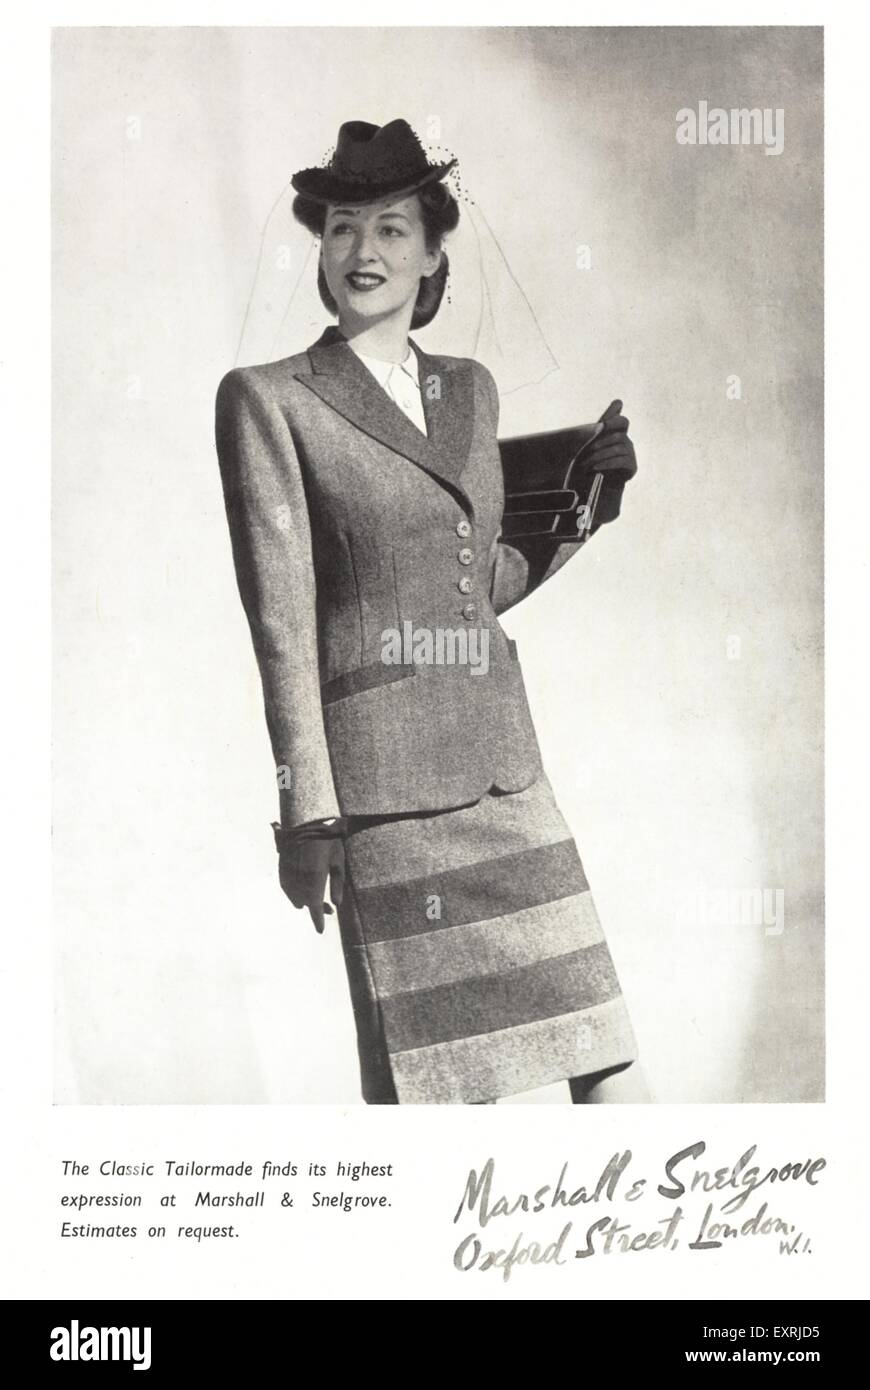 1940s UK Marshall & Snelgrove Magazine Advert - Stock Image